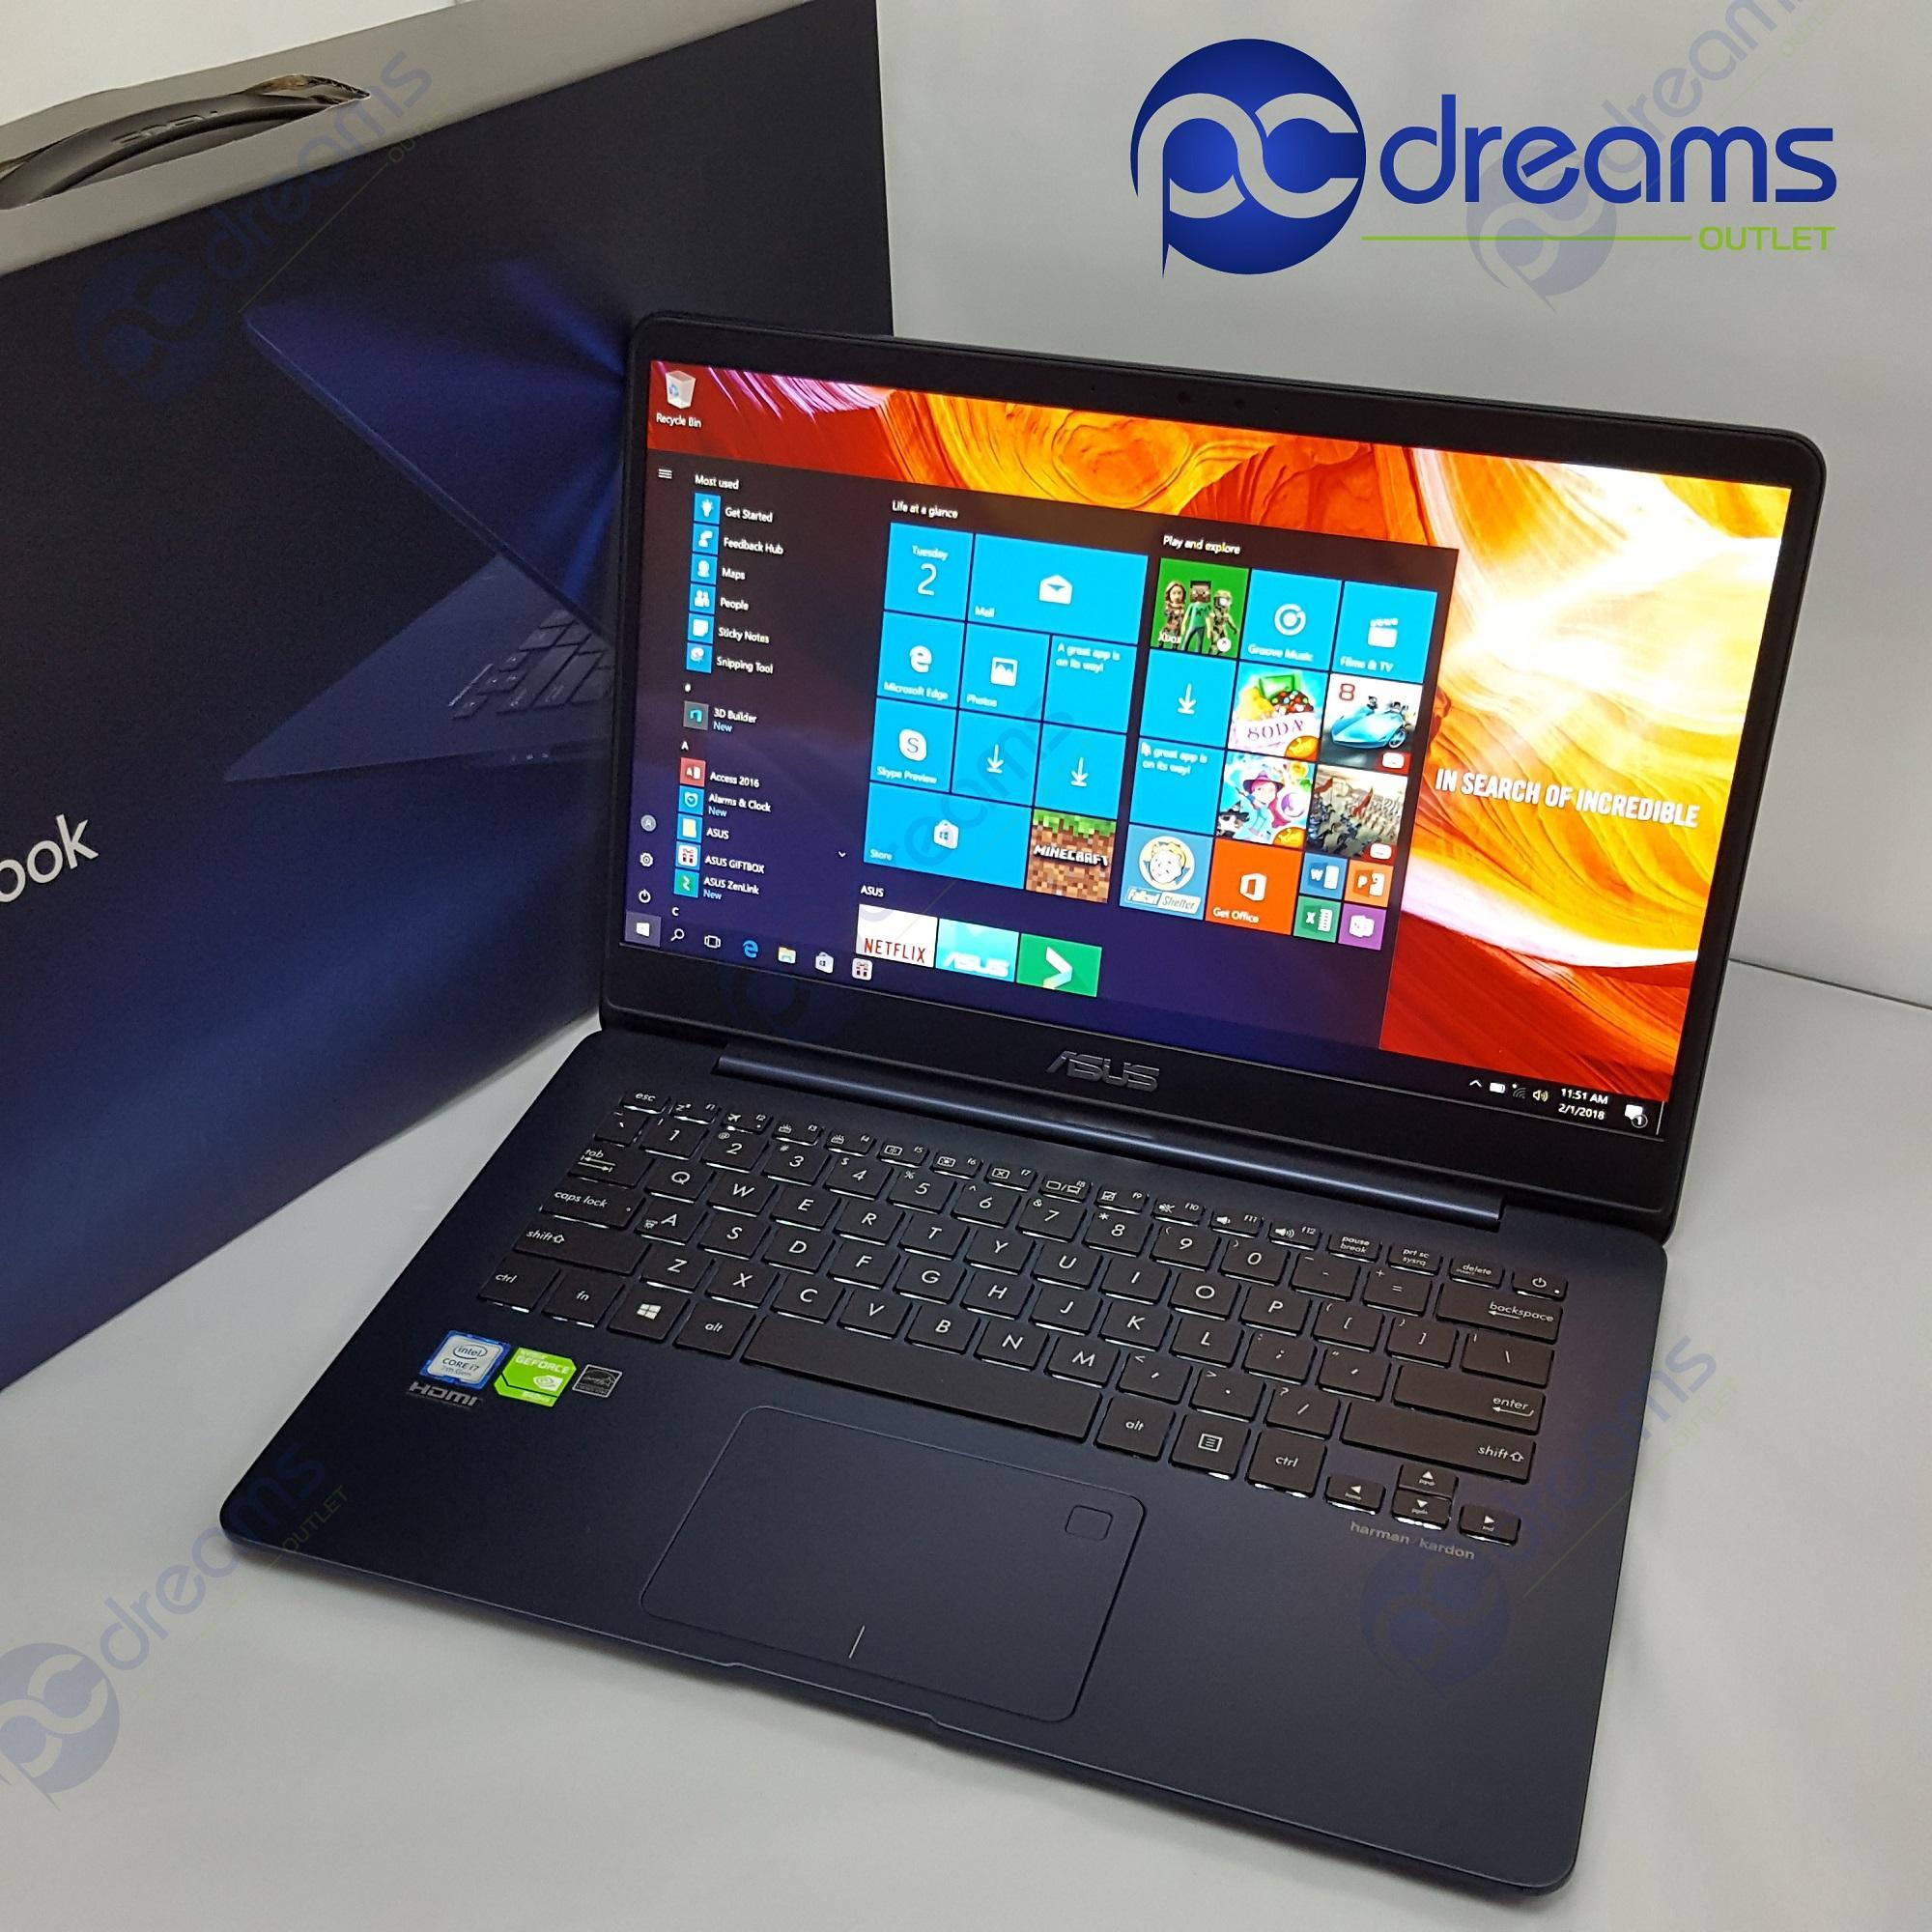 GSS PROMOTION! ASUS ZENBOOK UX430UN-GV027T i7-8550U/16GB/512GBSSD [Premium Refreshed]